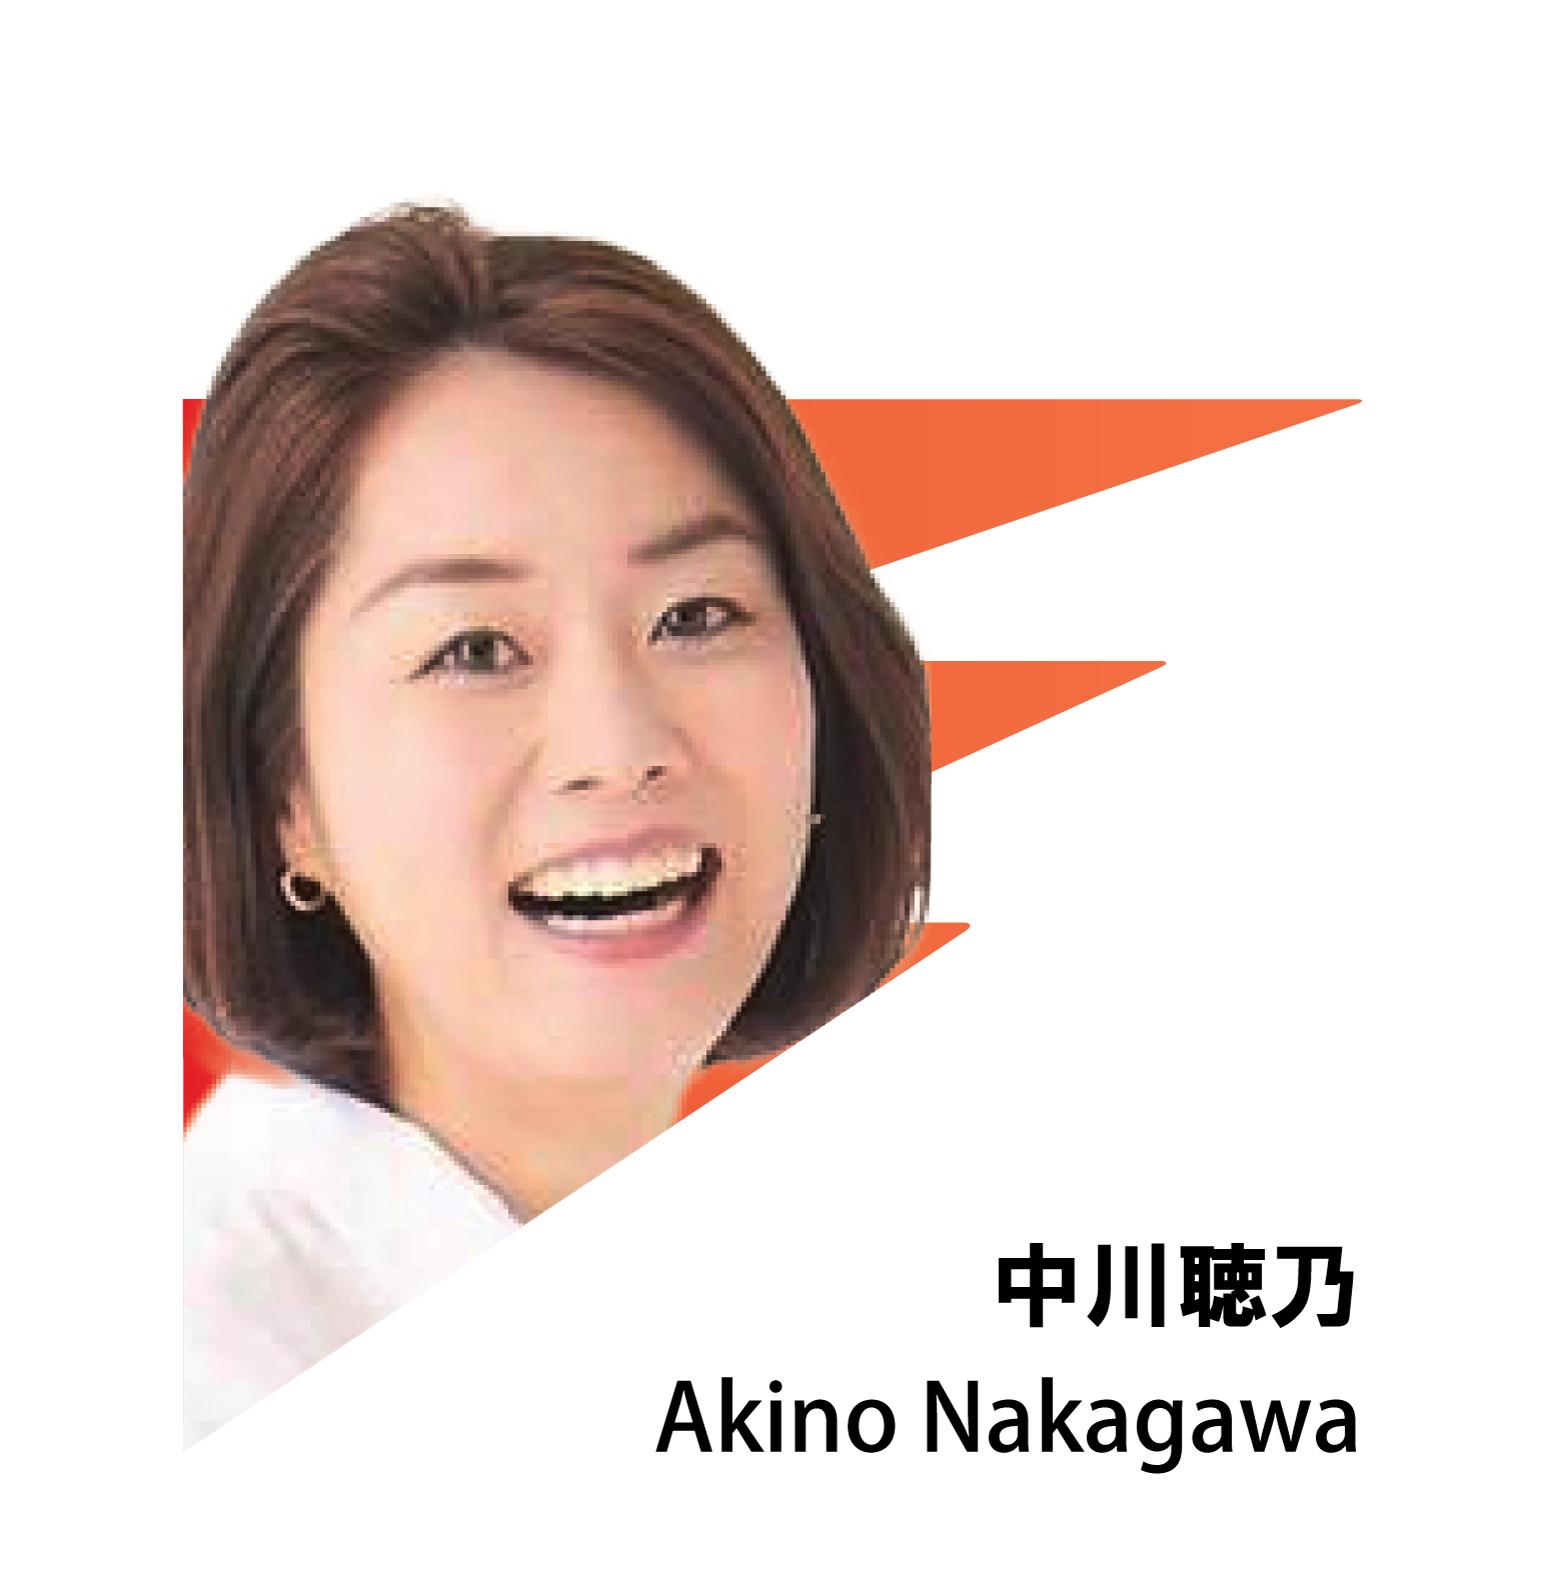 AKINO NAKAGAWA